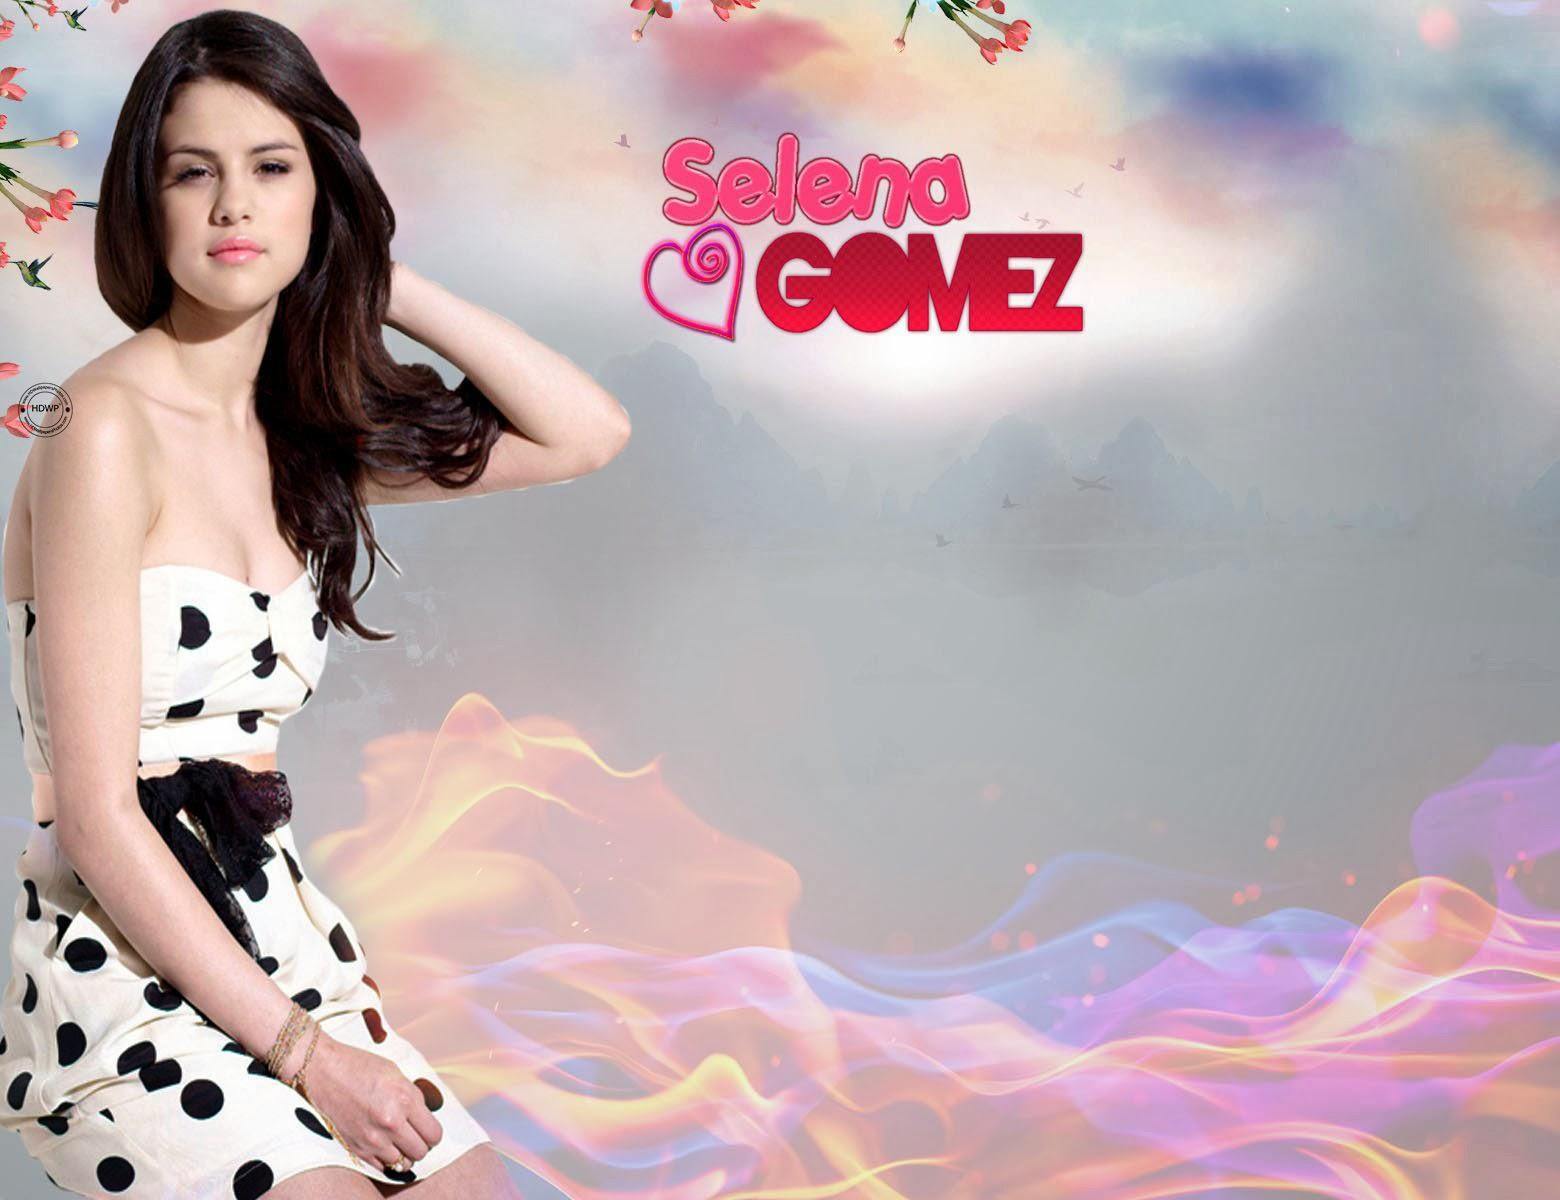 Selena gomez new hd wallpaper 2014 world fresh hd wallapers - Selena gomez latest hd wallpapers ...